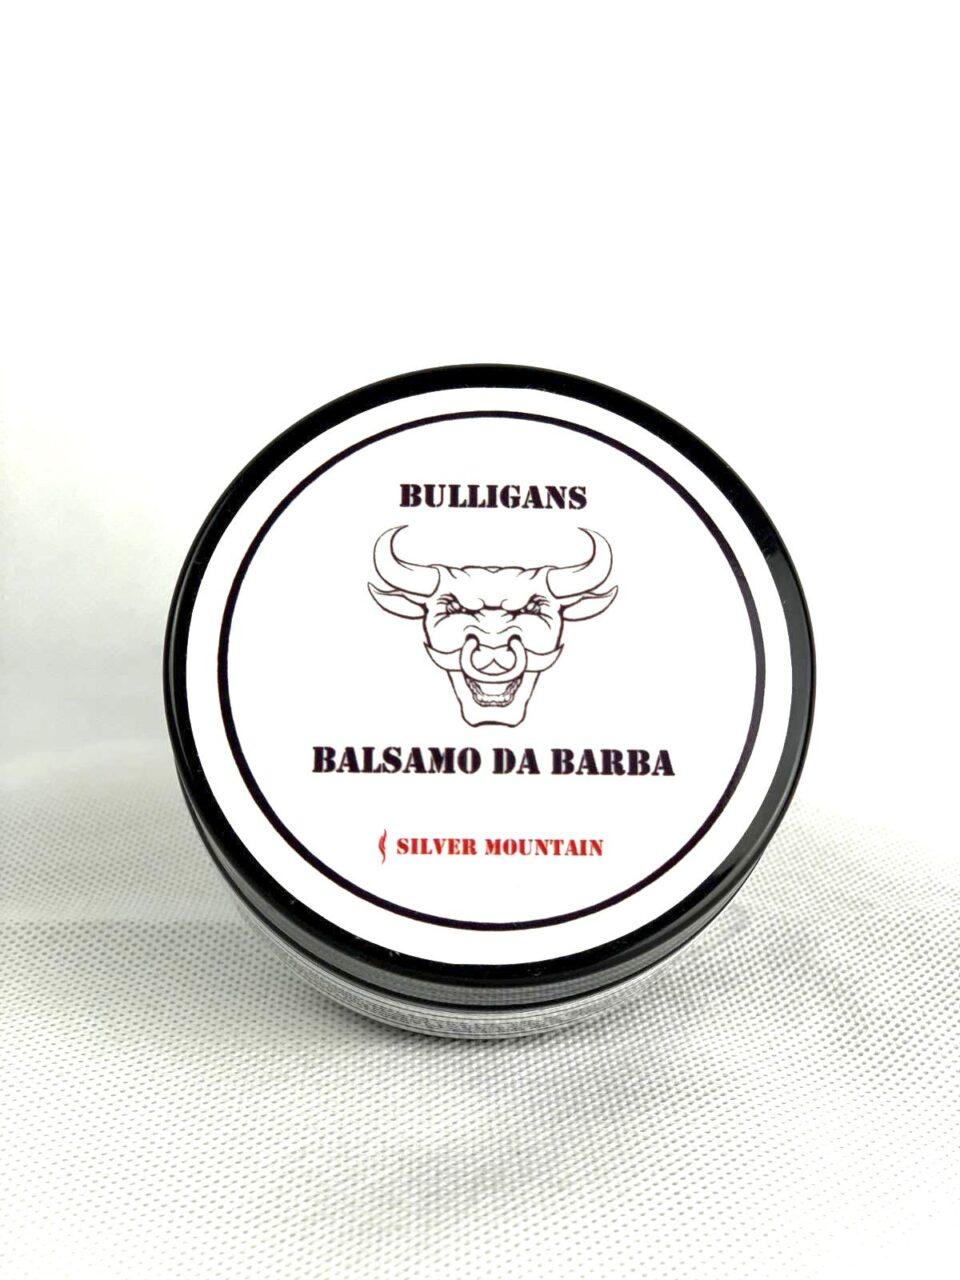 Recensione Olio e Balsamo Bulligans